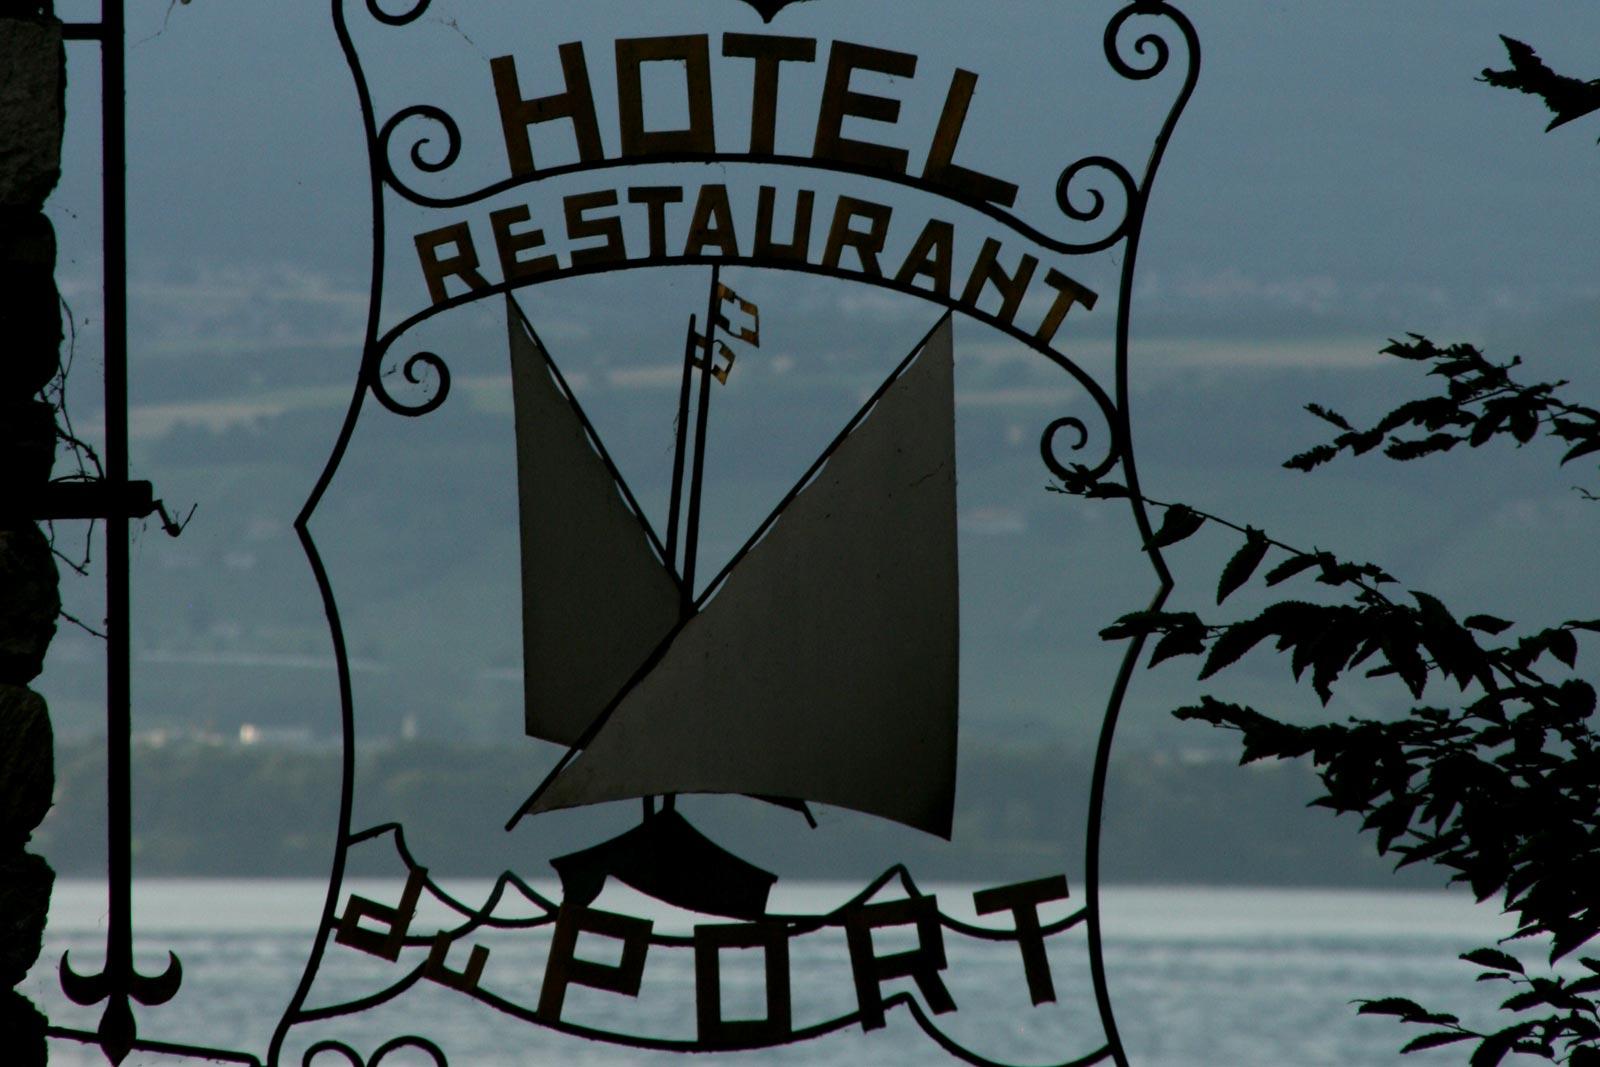 Hhôtel restaurant du Port, Yvoire.